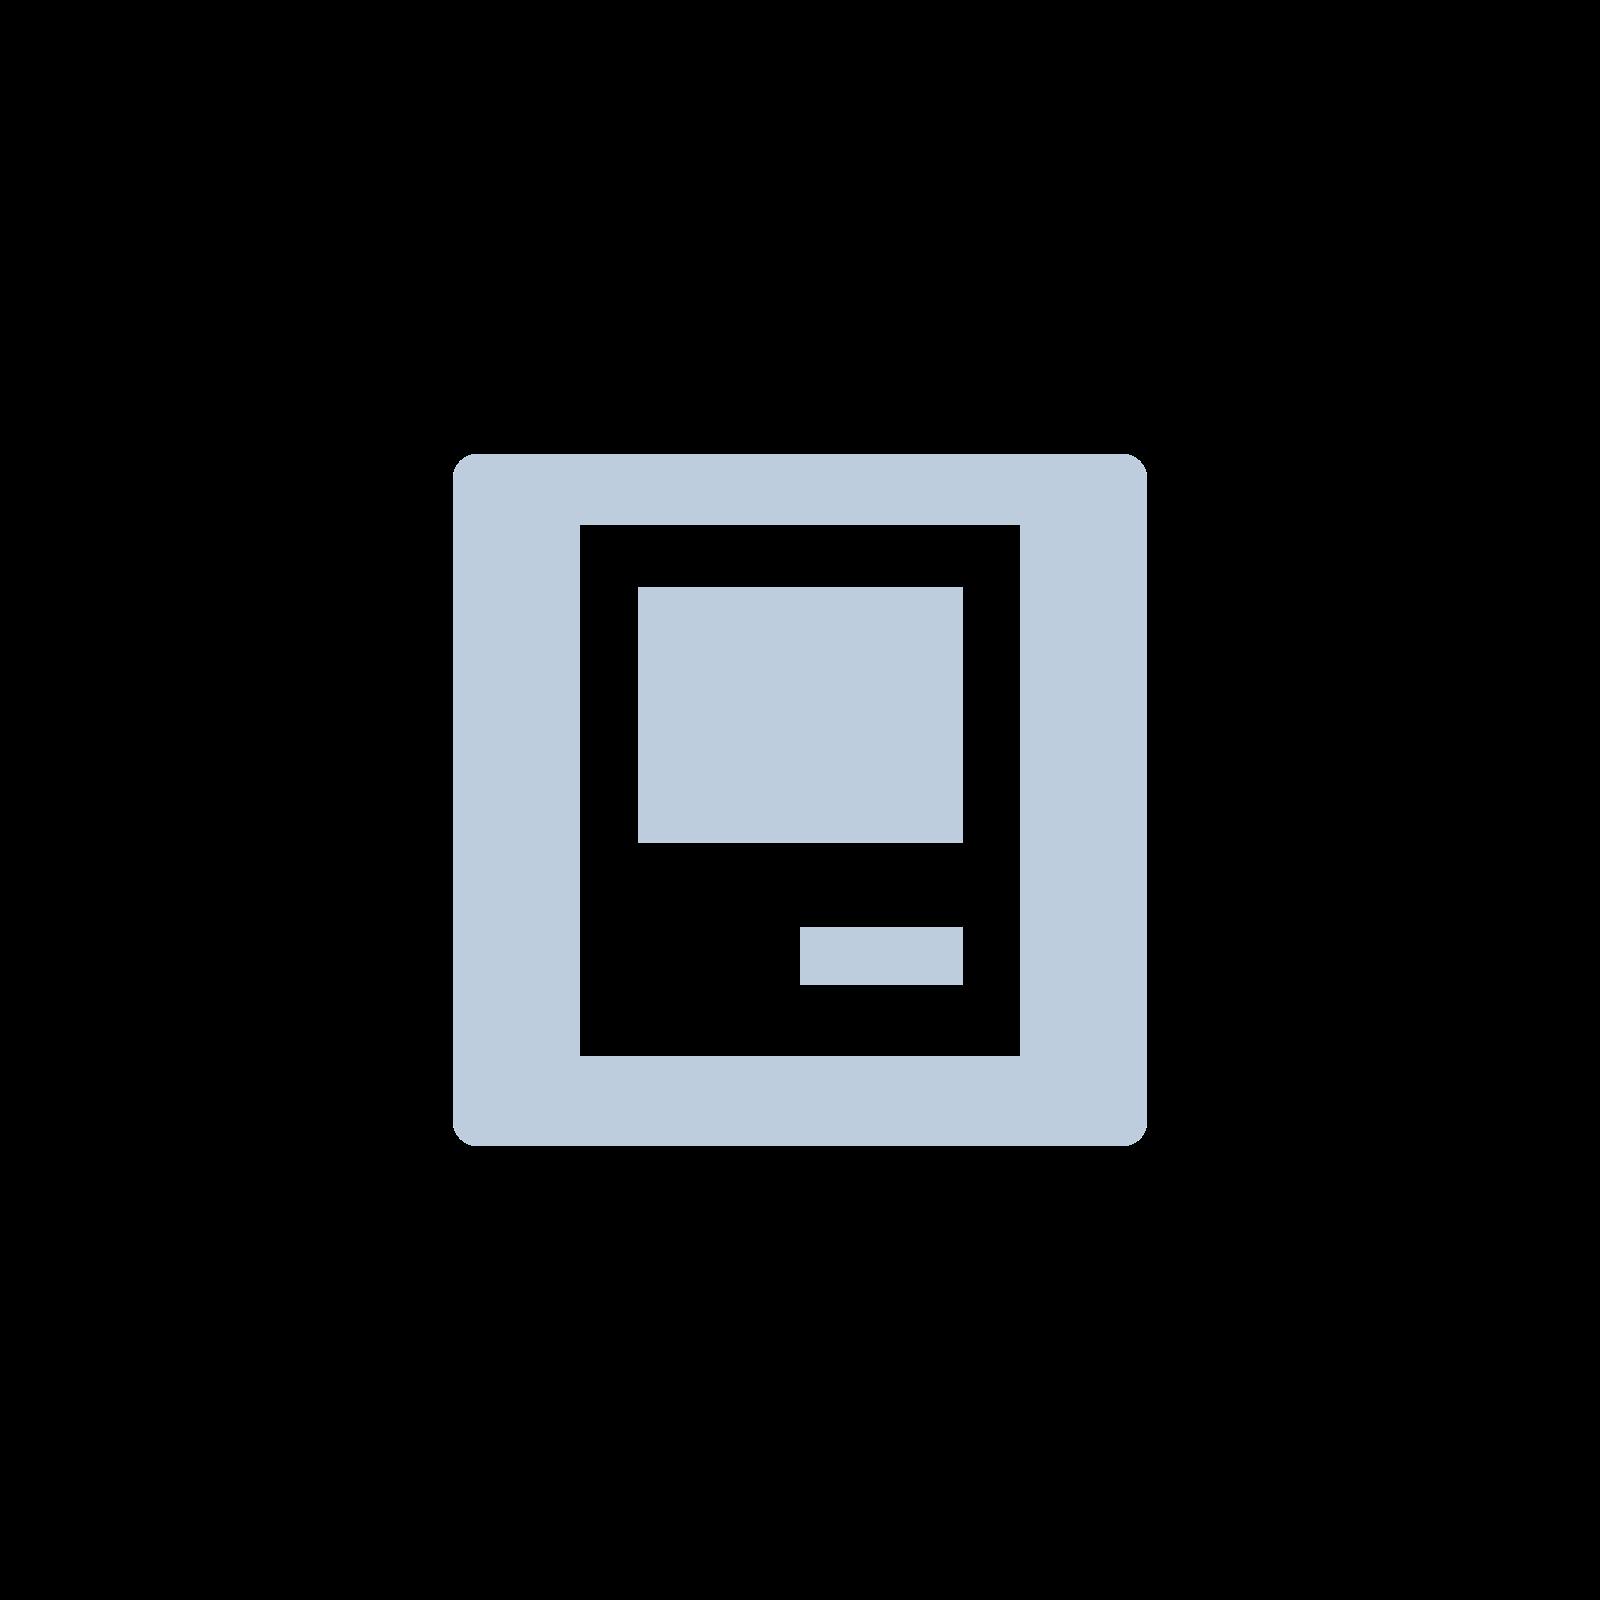 Mac Pro Intel QuadCore 2.8GHz (macpro3,1, 500GB + 1TB, 4GB RAM)